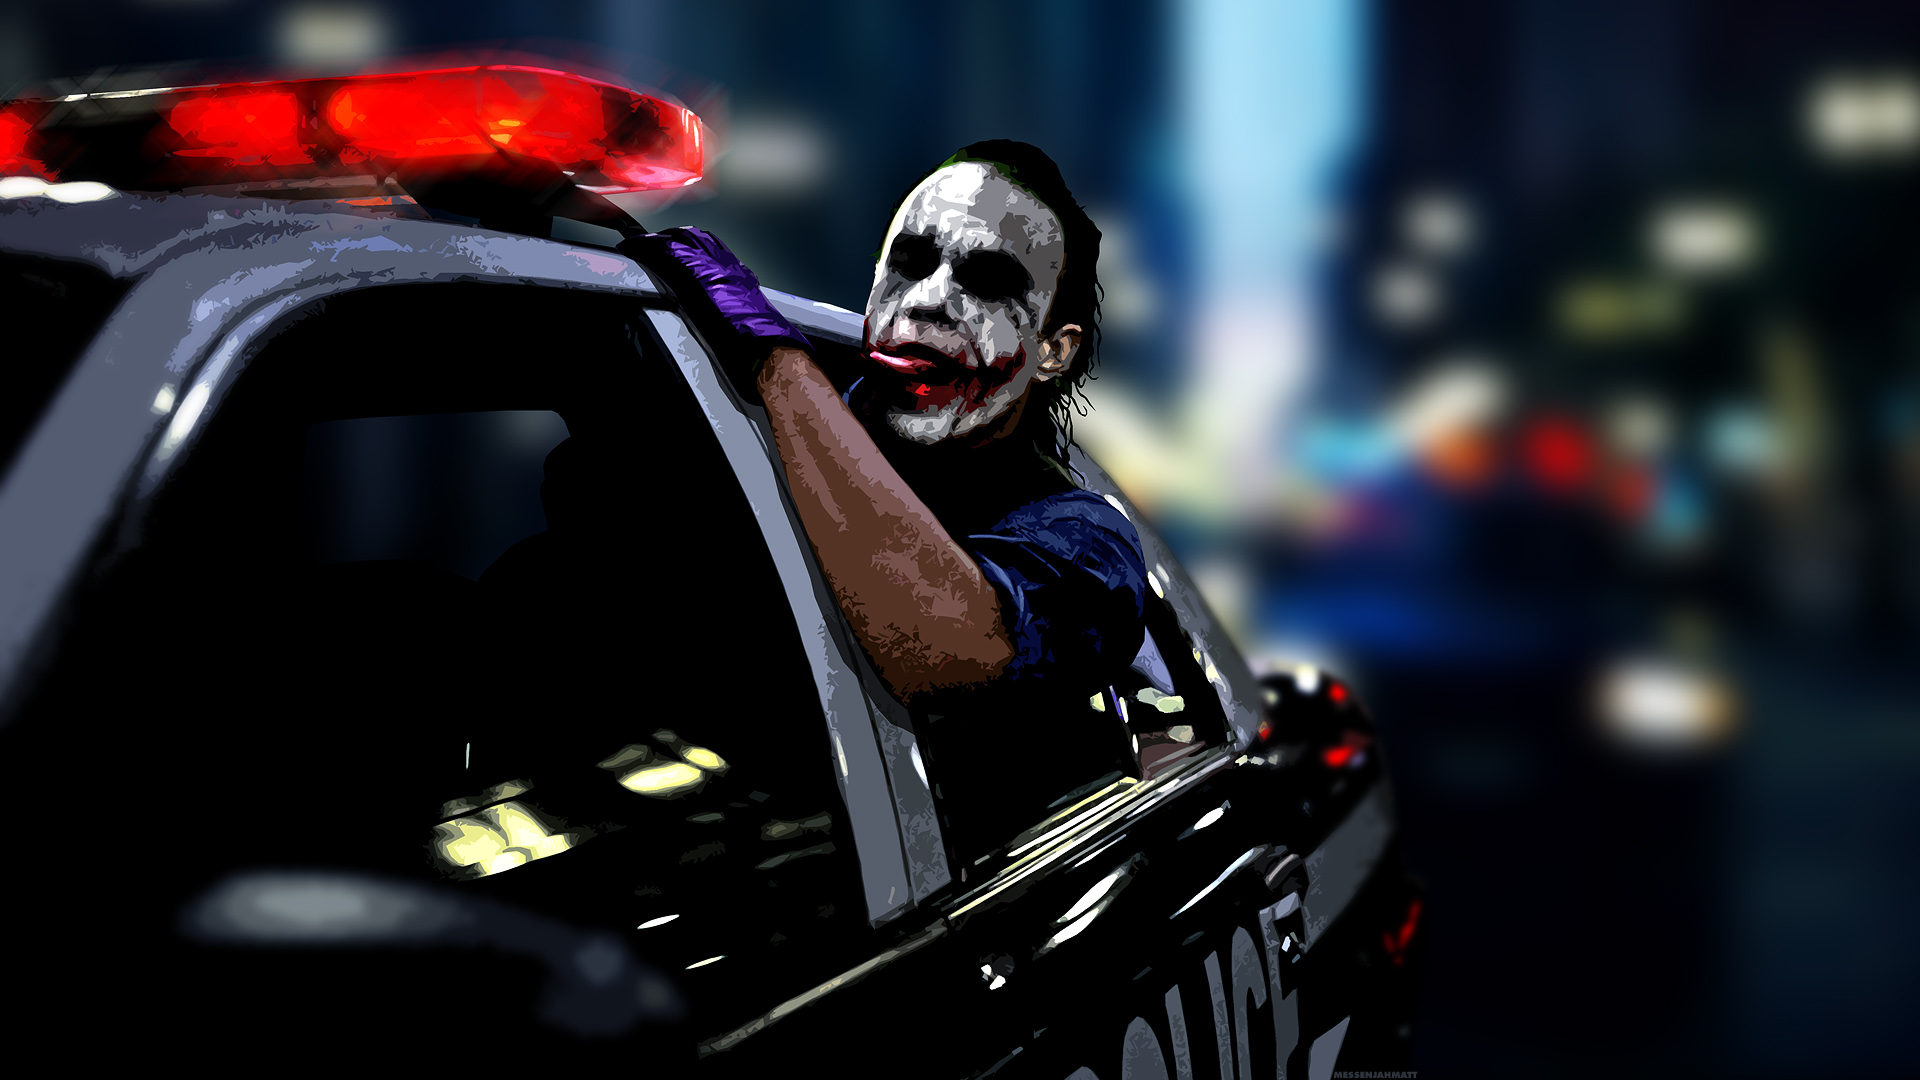 The Dark Knight Hd Wallpaper Background Image 1920x1080 Id